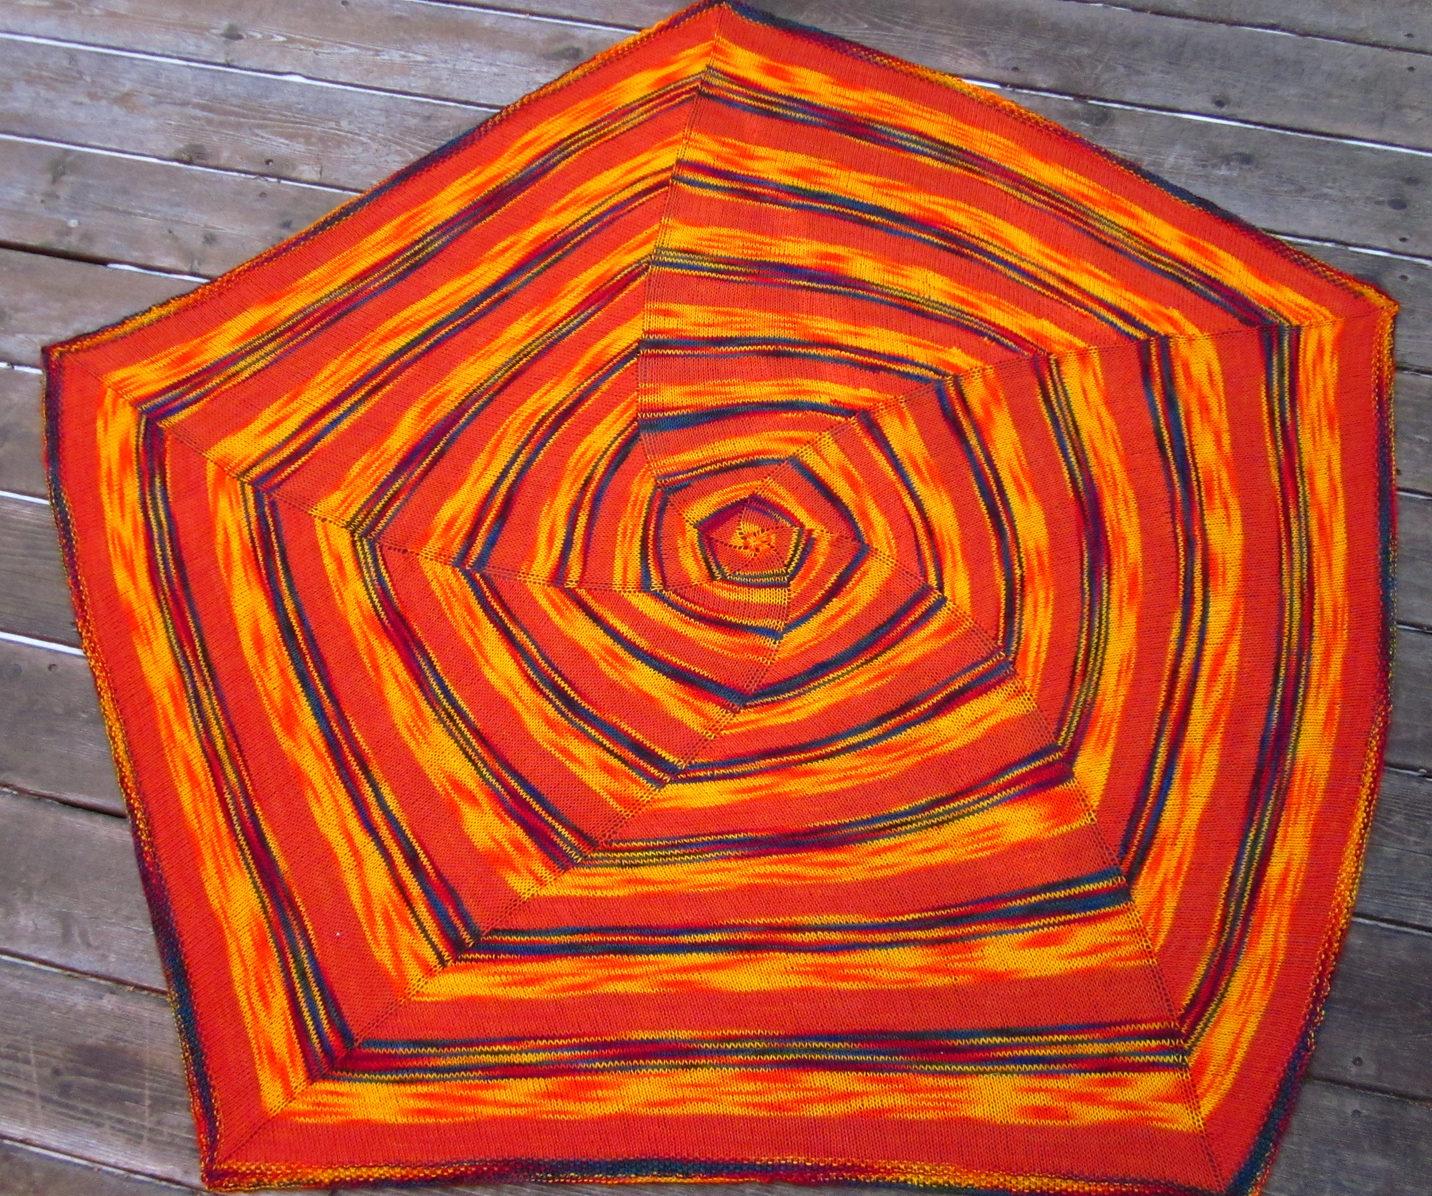 Free Knitting Pattern for Spiral Light Baby Blanket